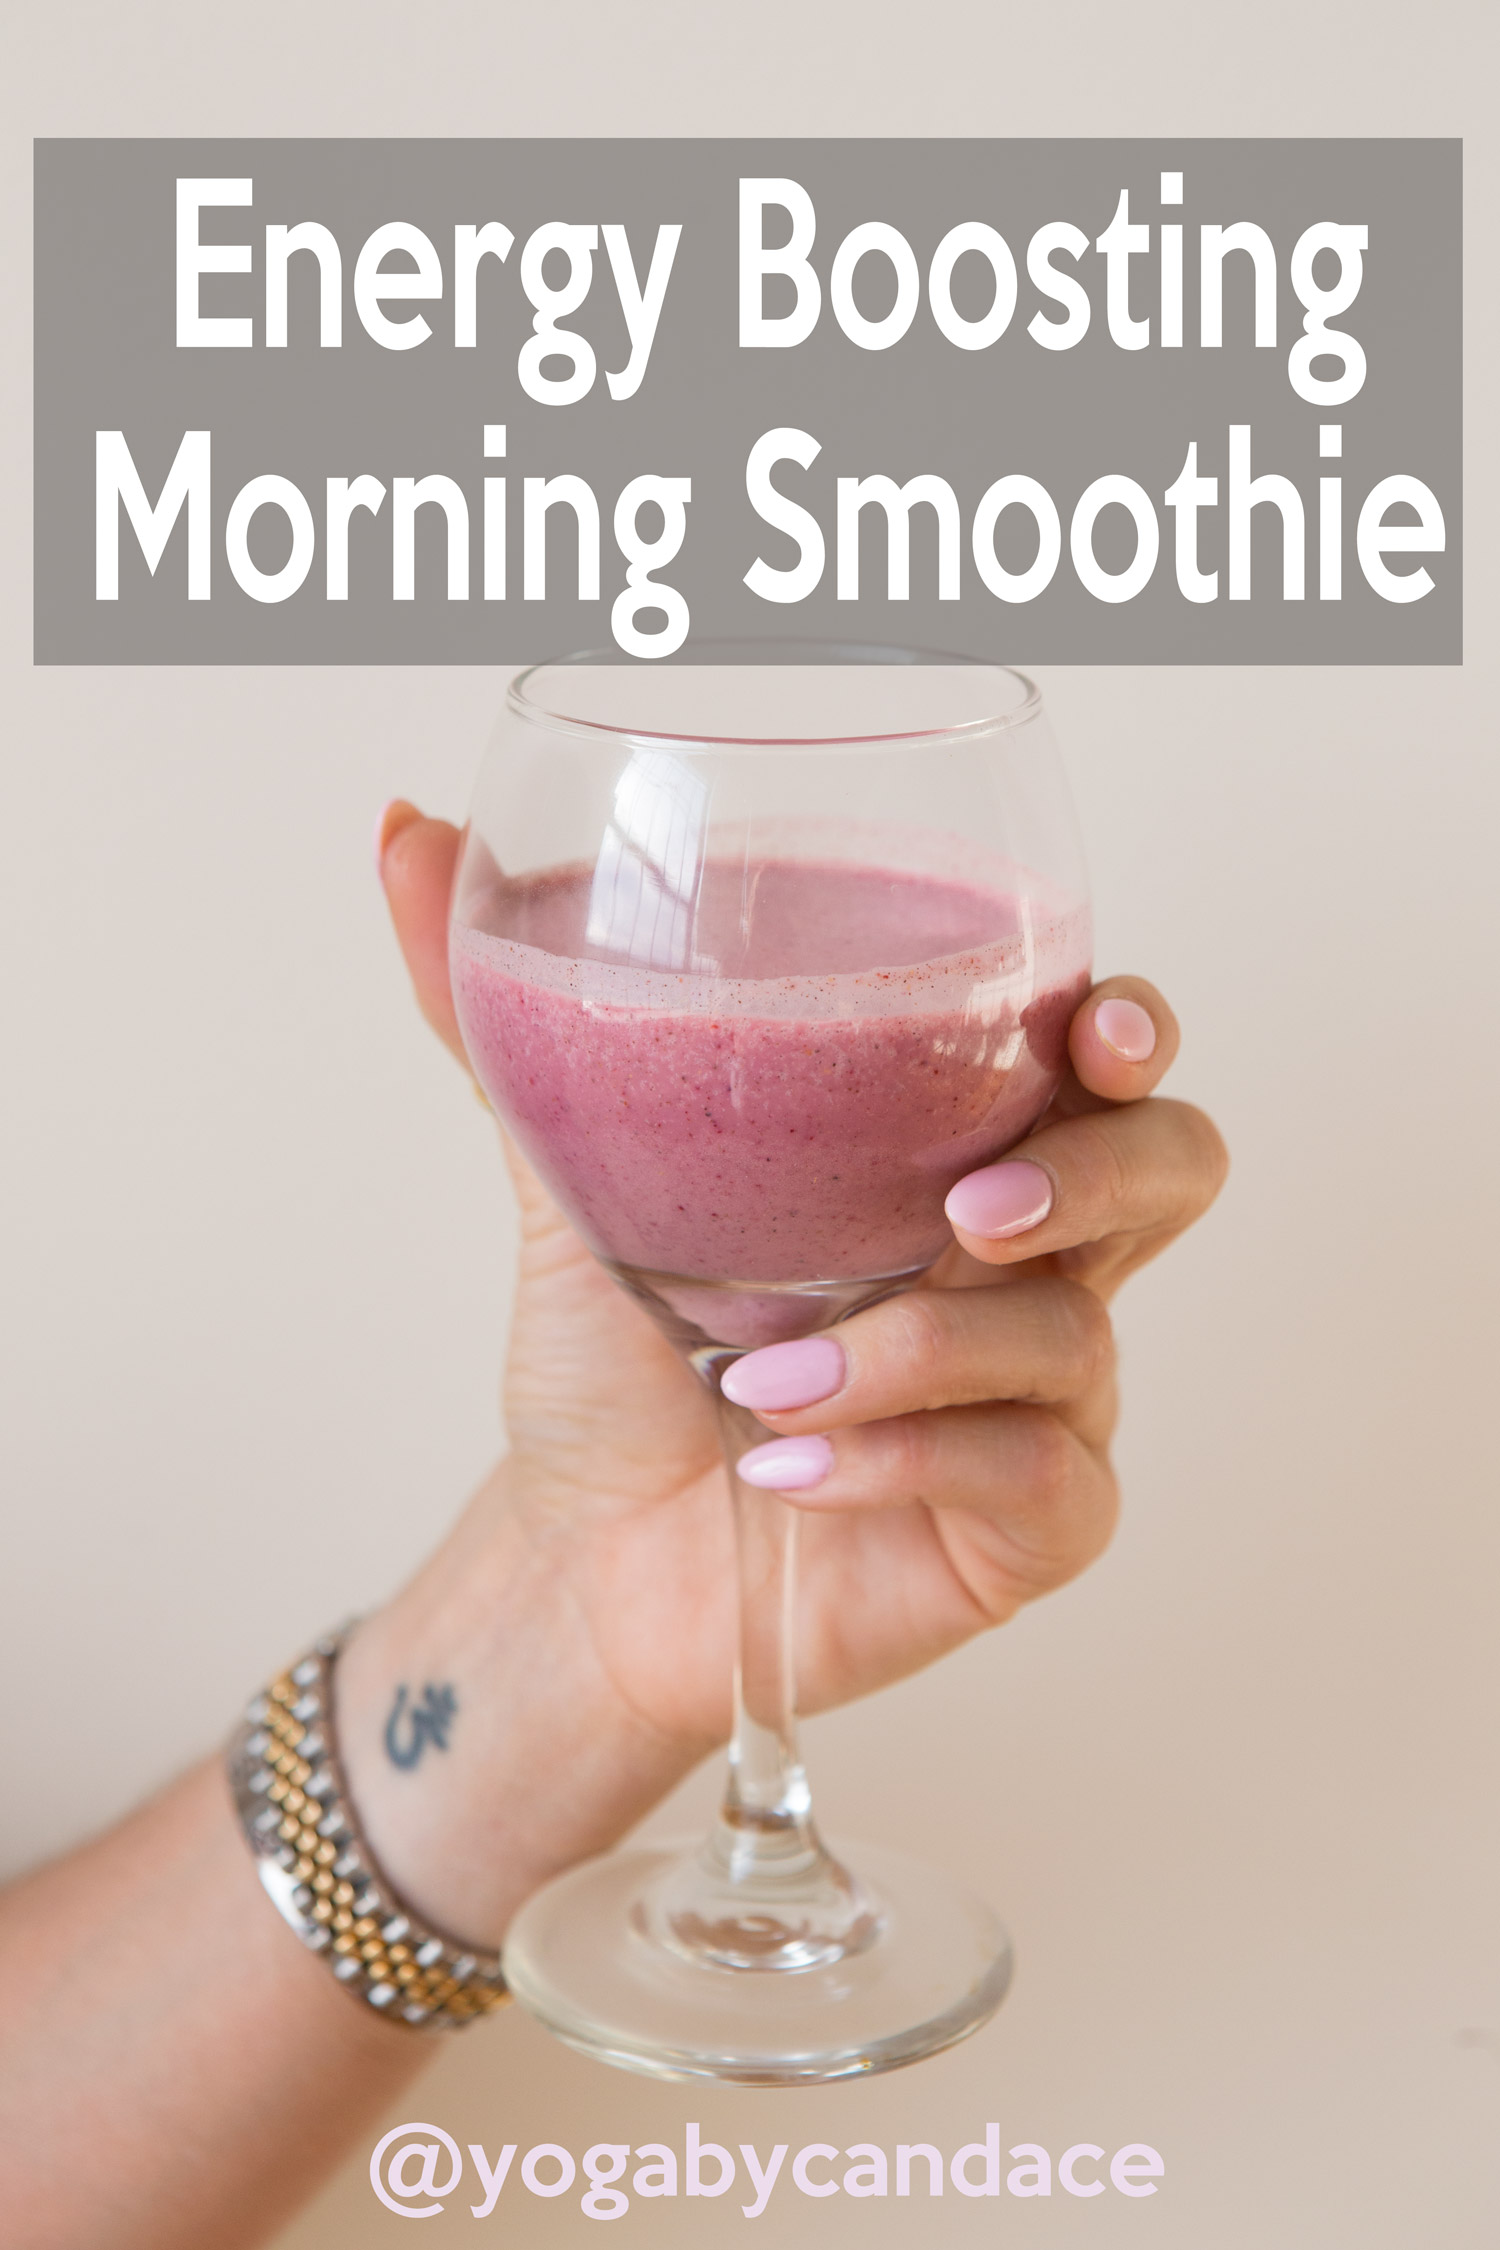 Energy Boosting Morning Smoothie Recipe